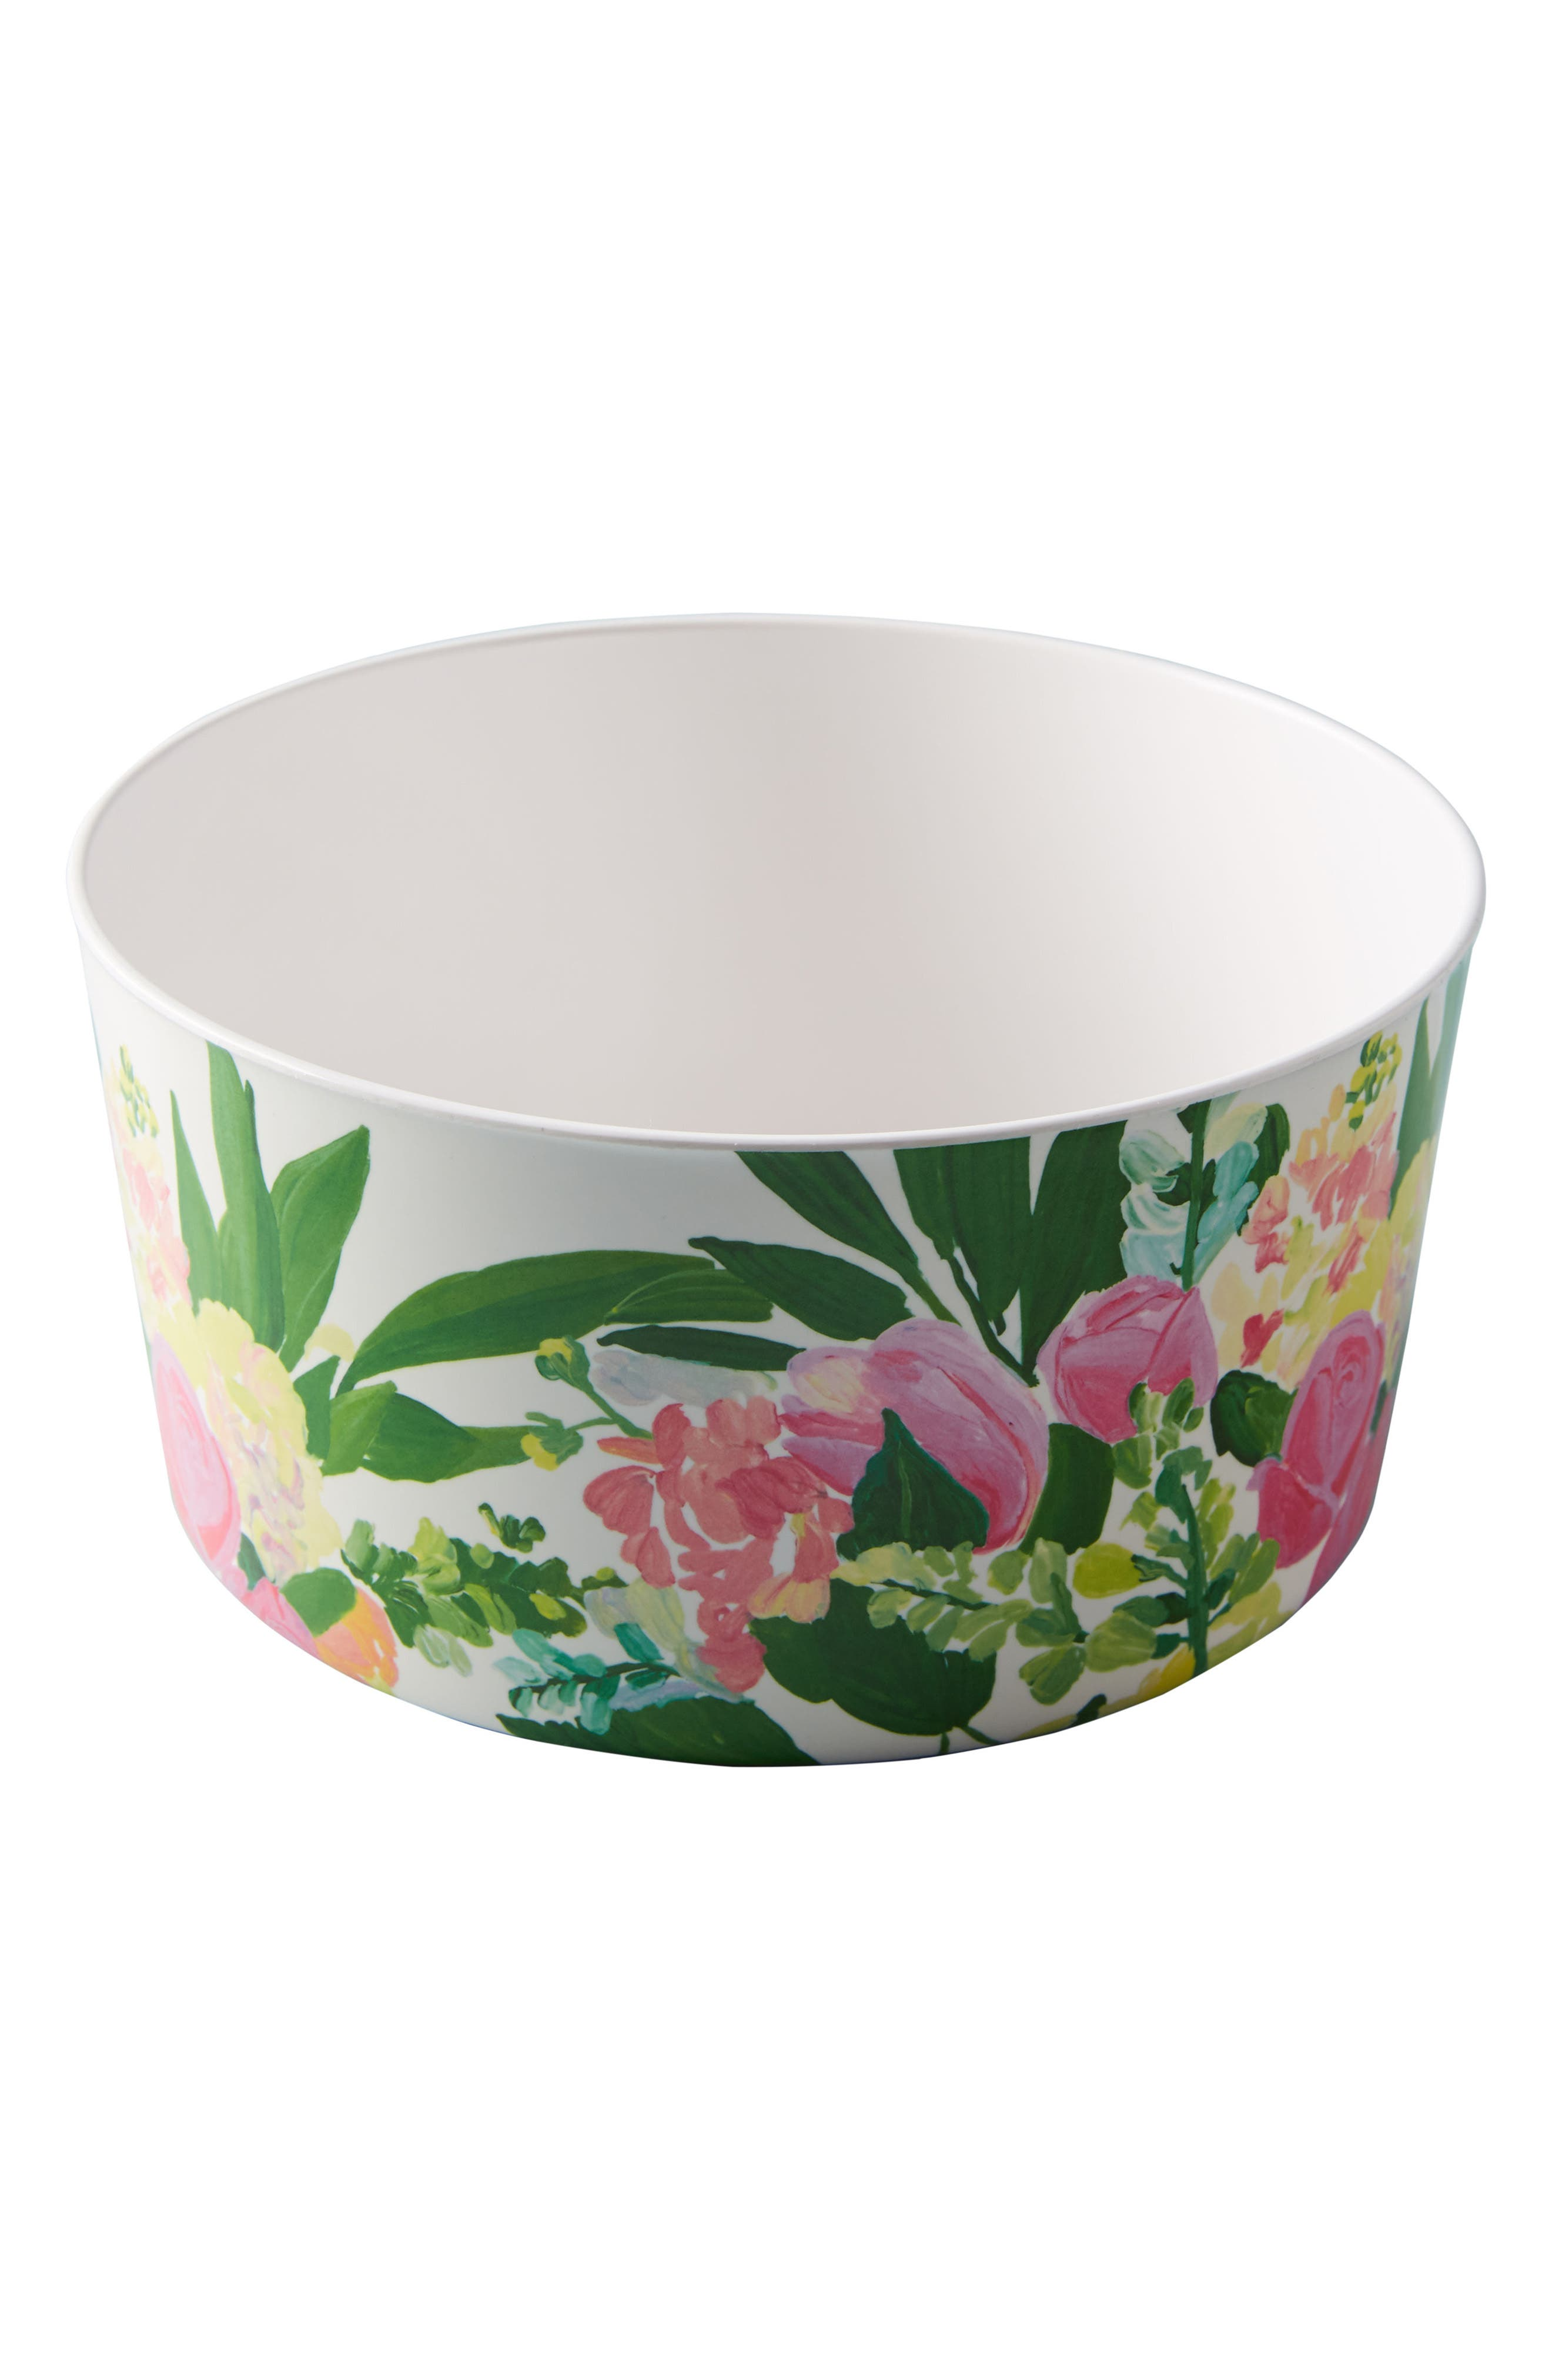 Paint + Petals Melamine Storage Bowl,                             Alternate thumbnail 3, color,                             WHITE MULTI